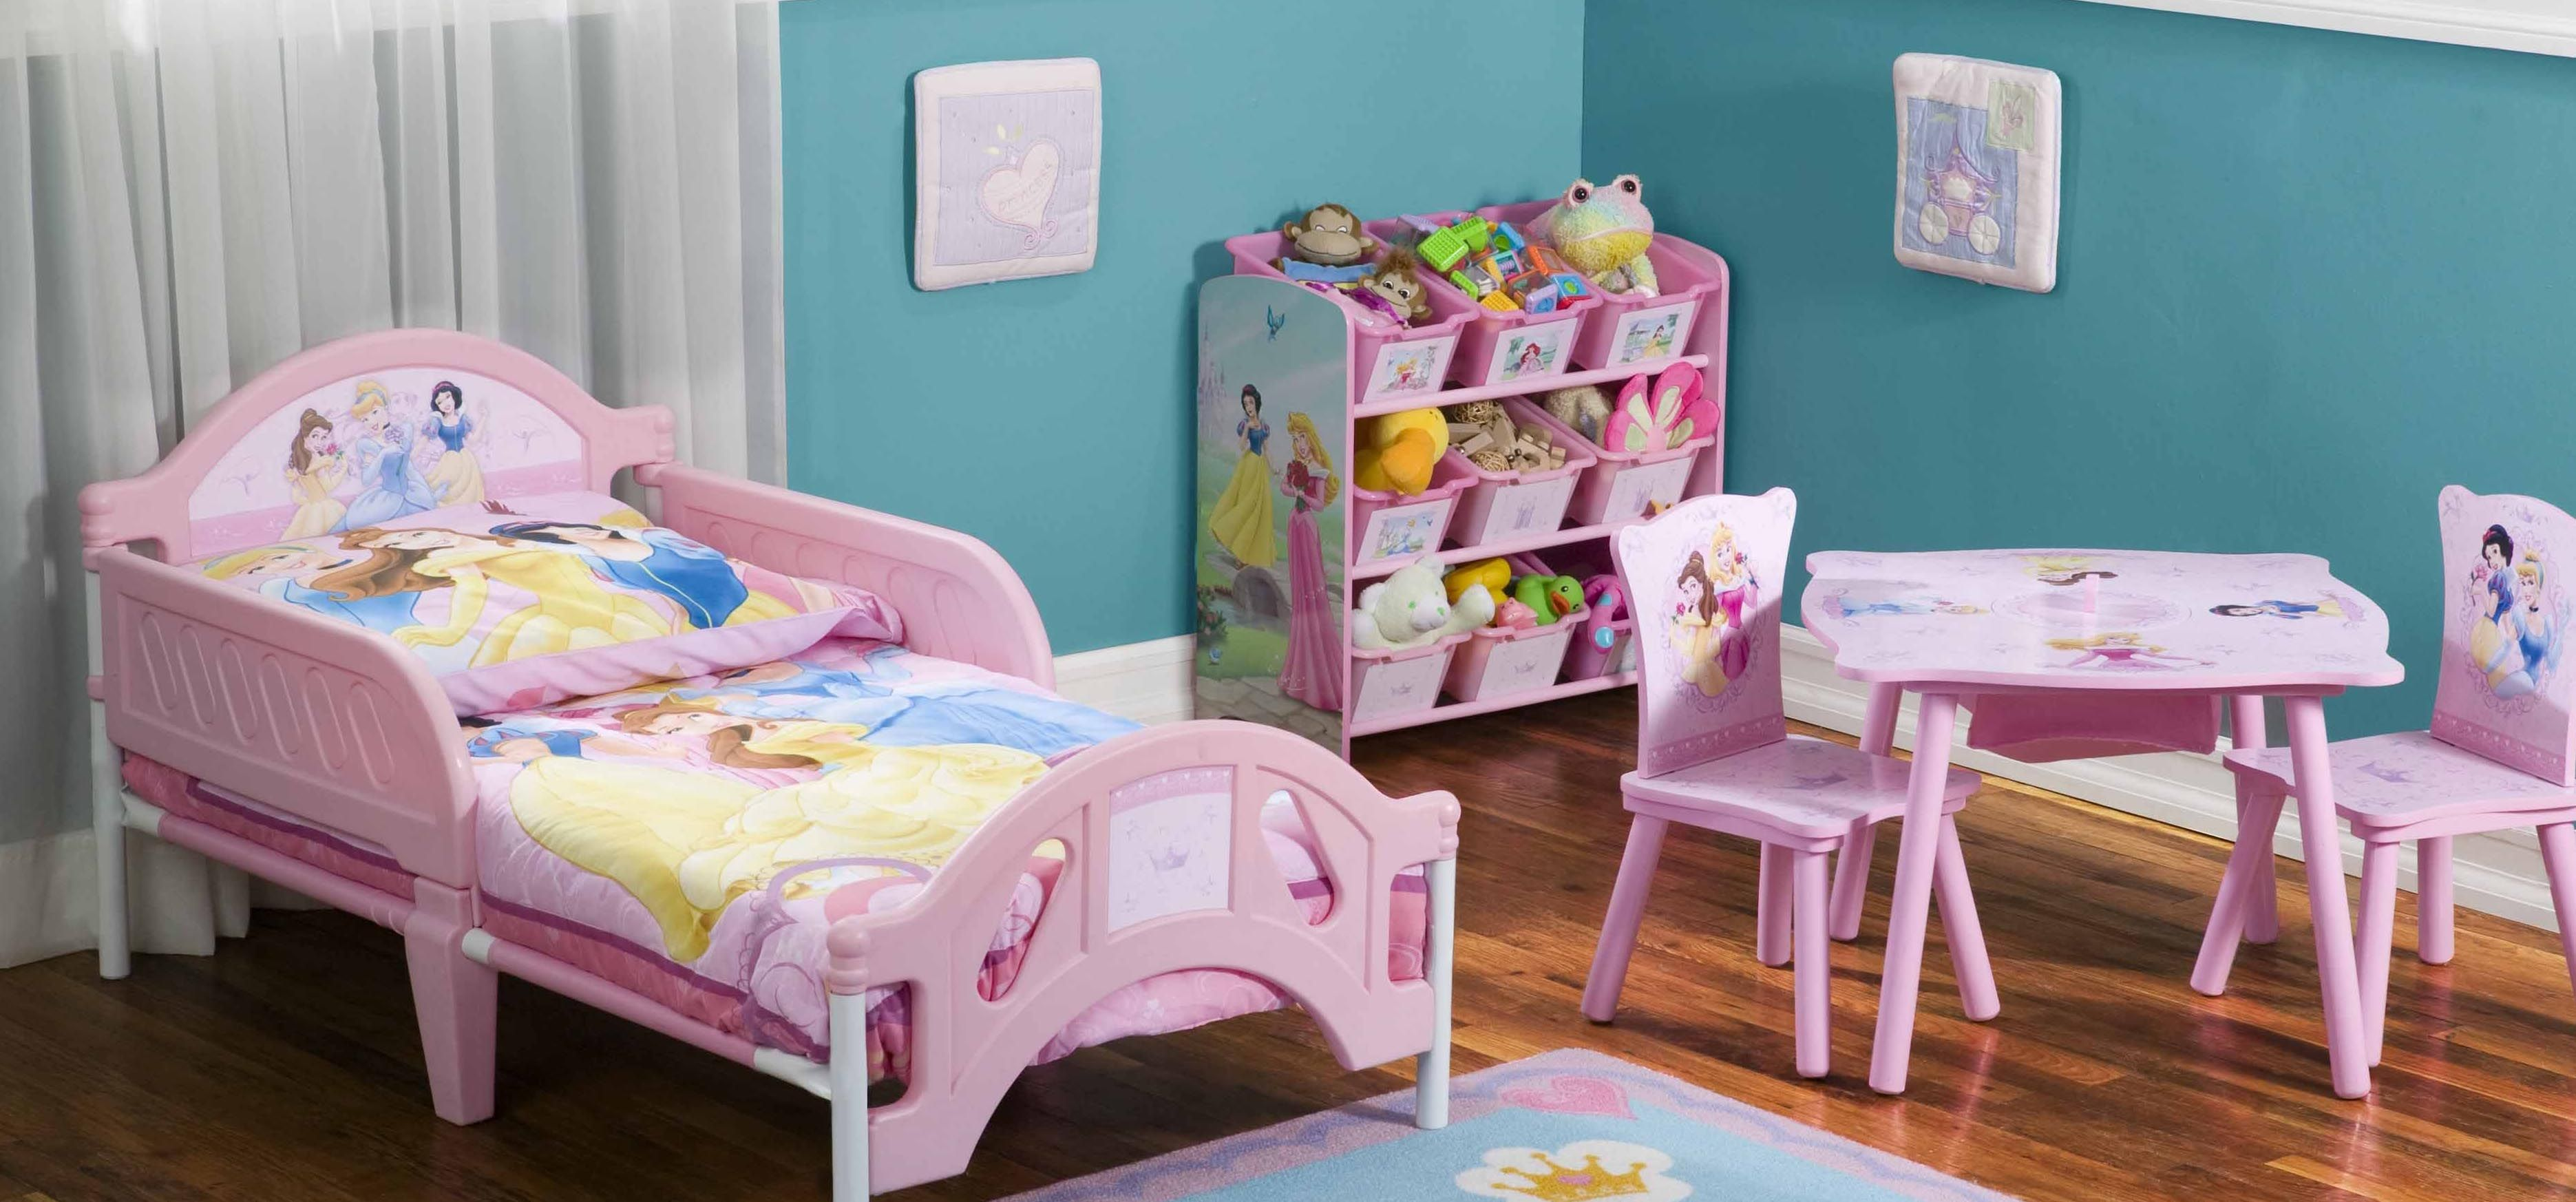 Disney Princess Toddler Room Disney Princess Toys R Us